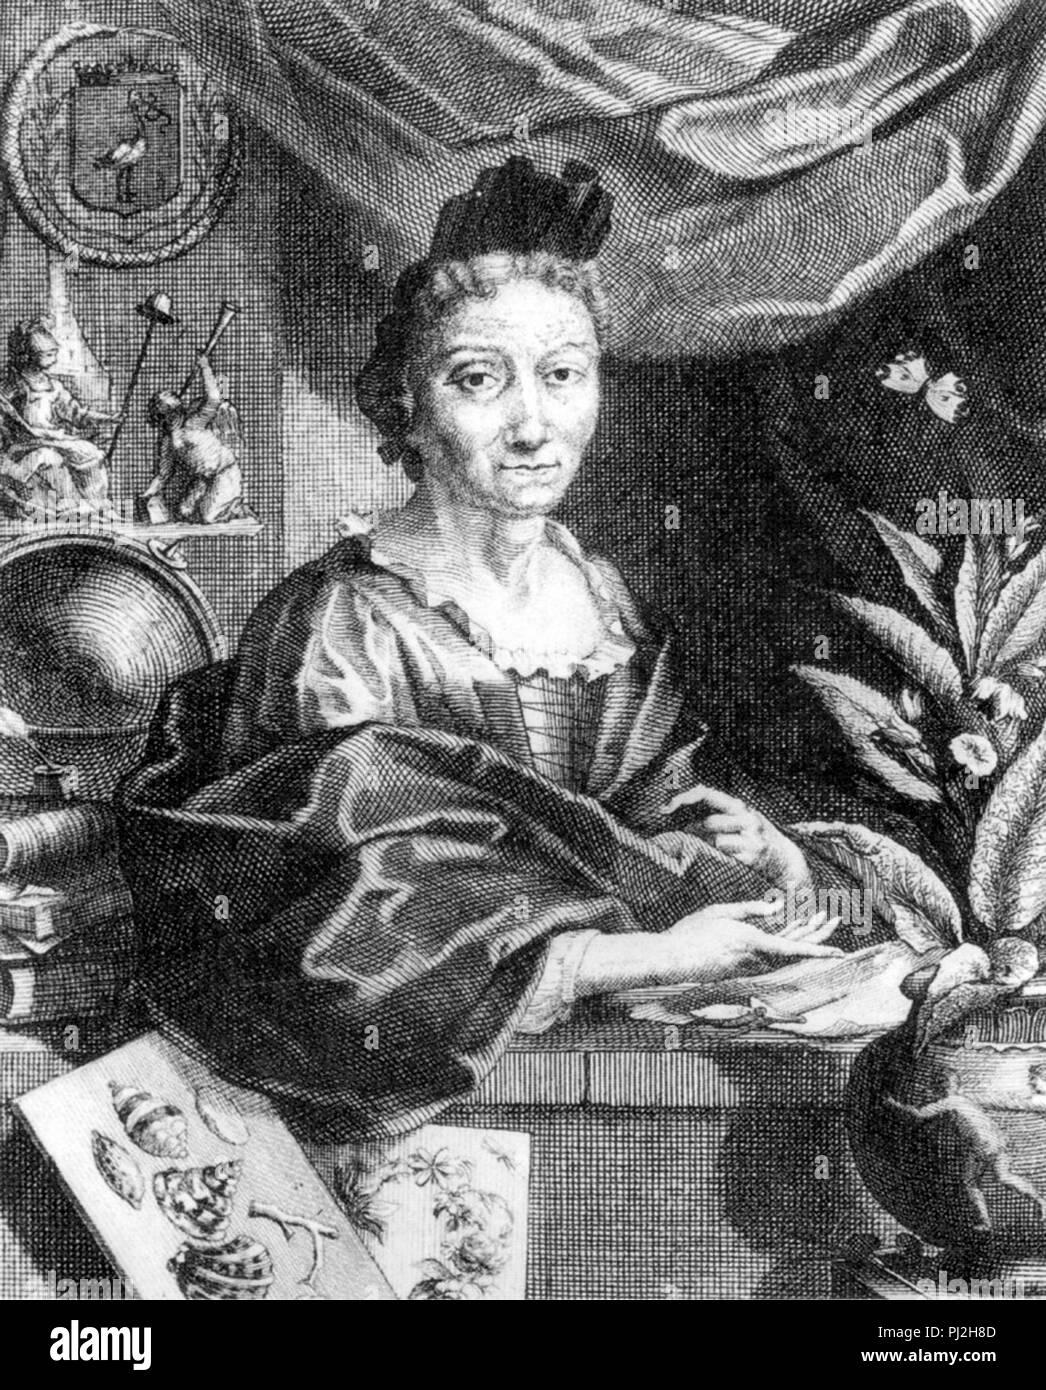 Maria Sibylla Merian (1647 – 1717) German naturalist and scientific illustrator - Stock Image